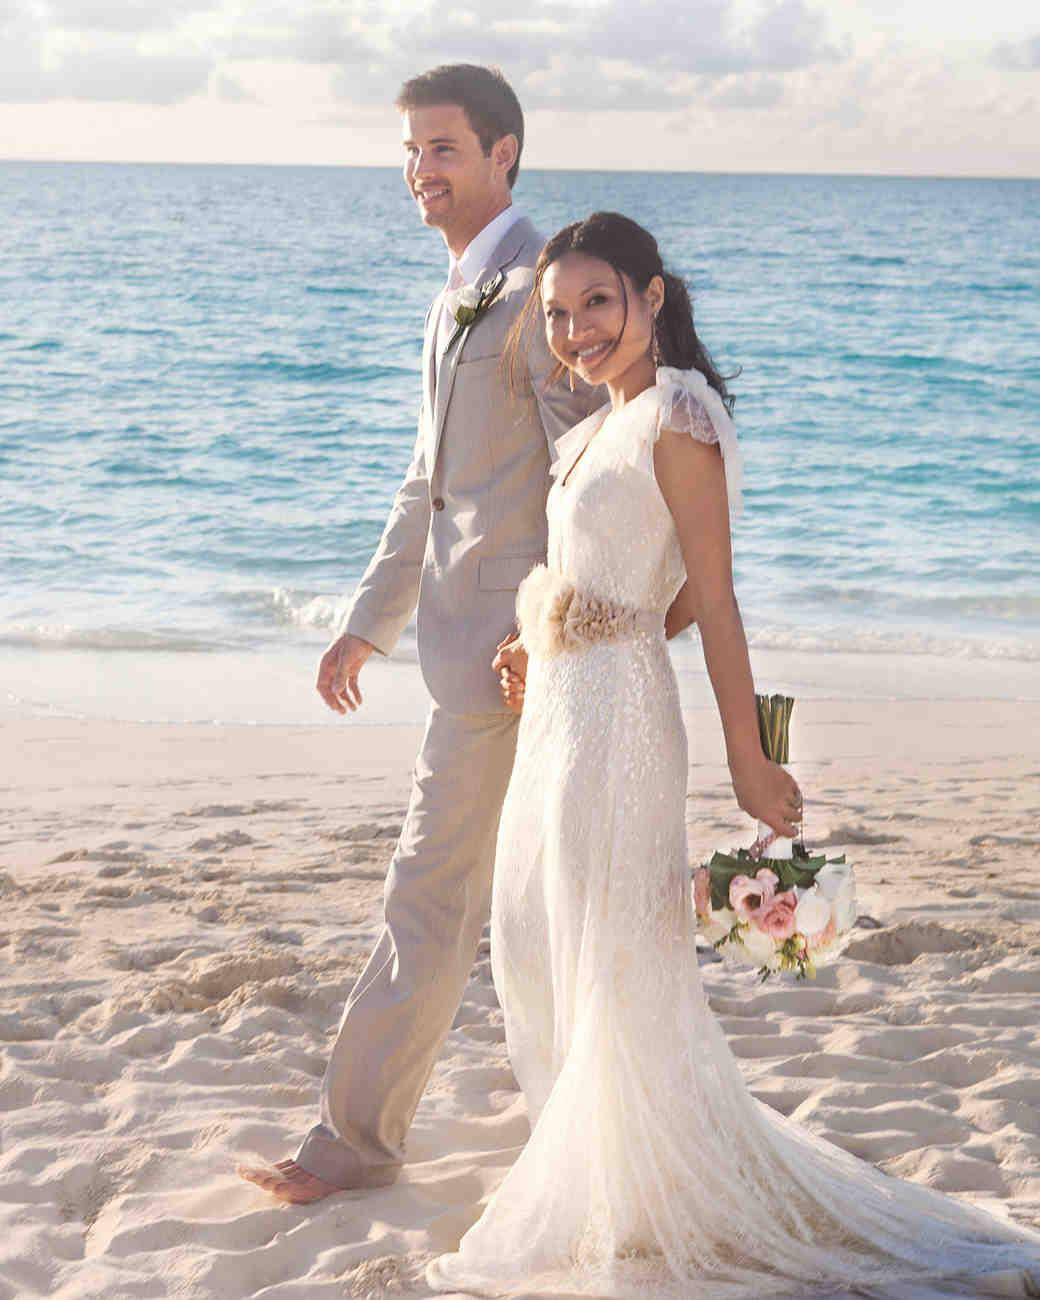 A Romantic Vintage Destination Wedding In Turks And Caicos: Tropical Island Beach Wedding Dresses At Reisefeber.org